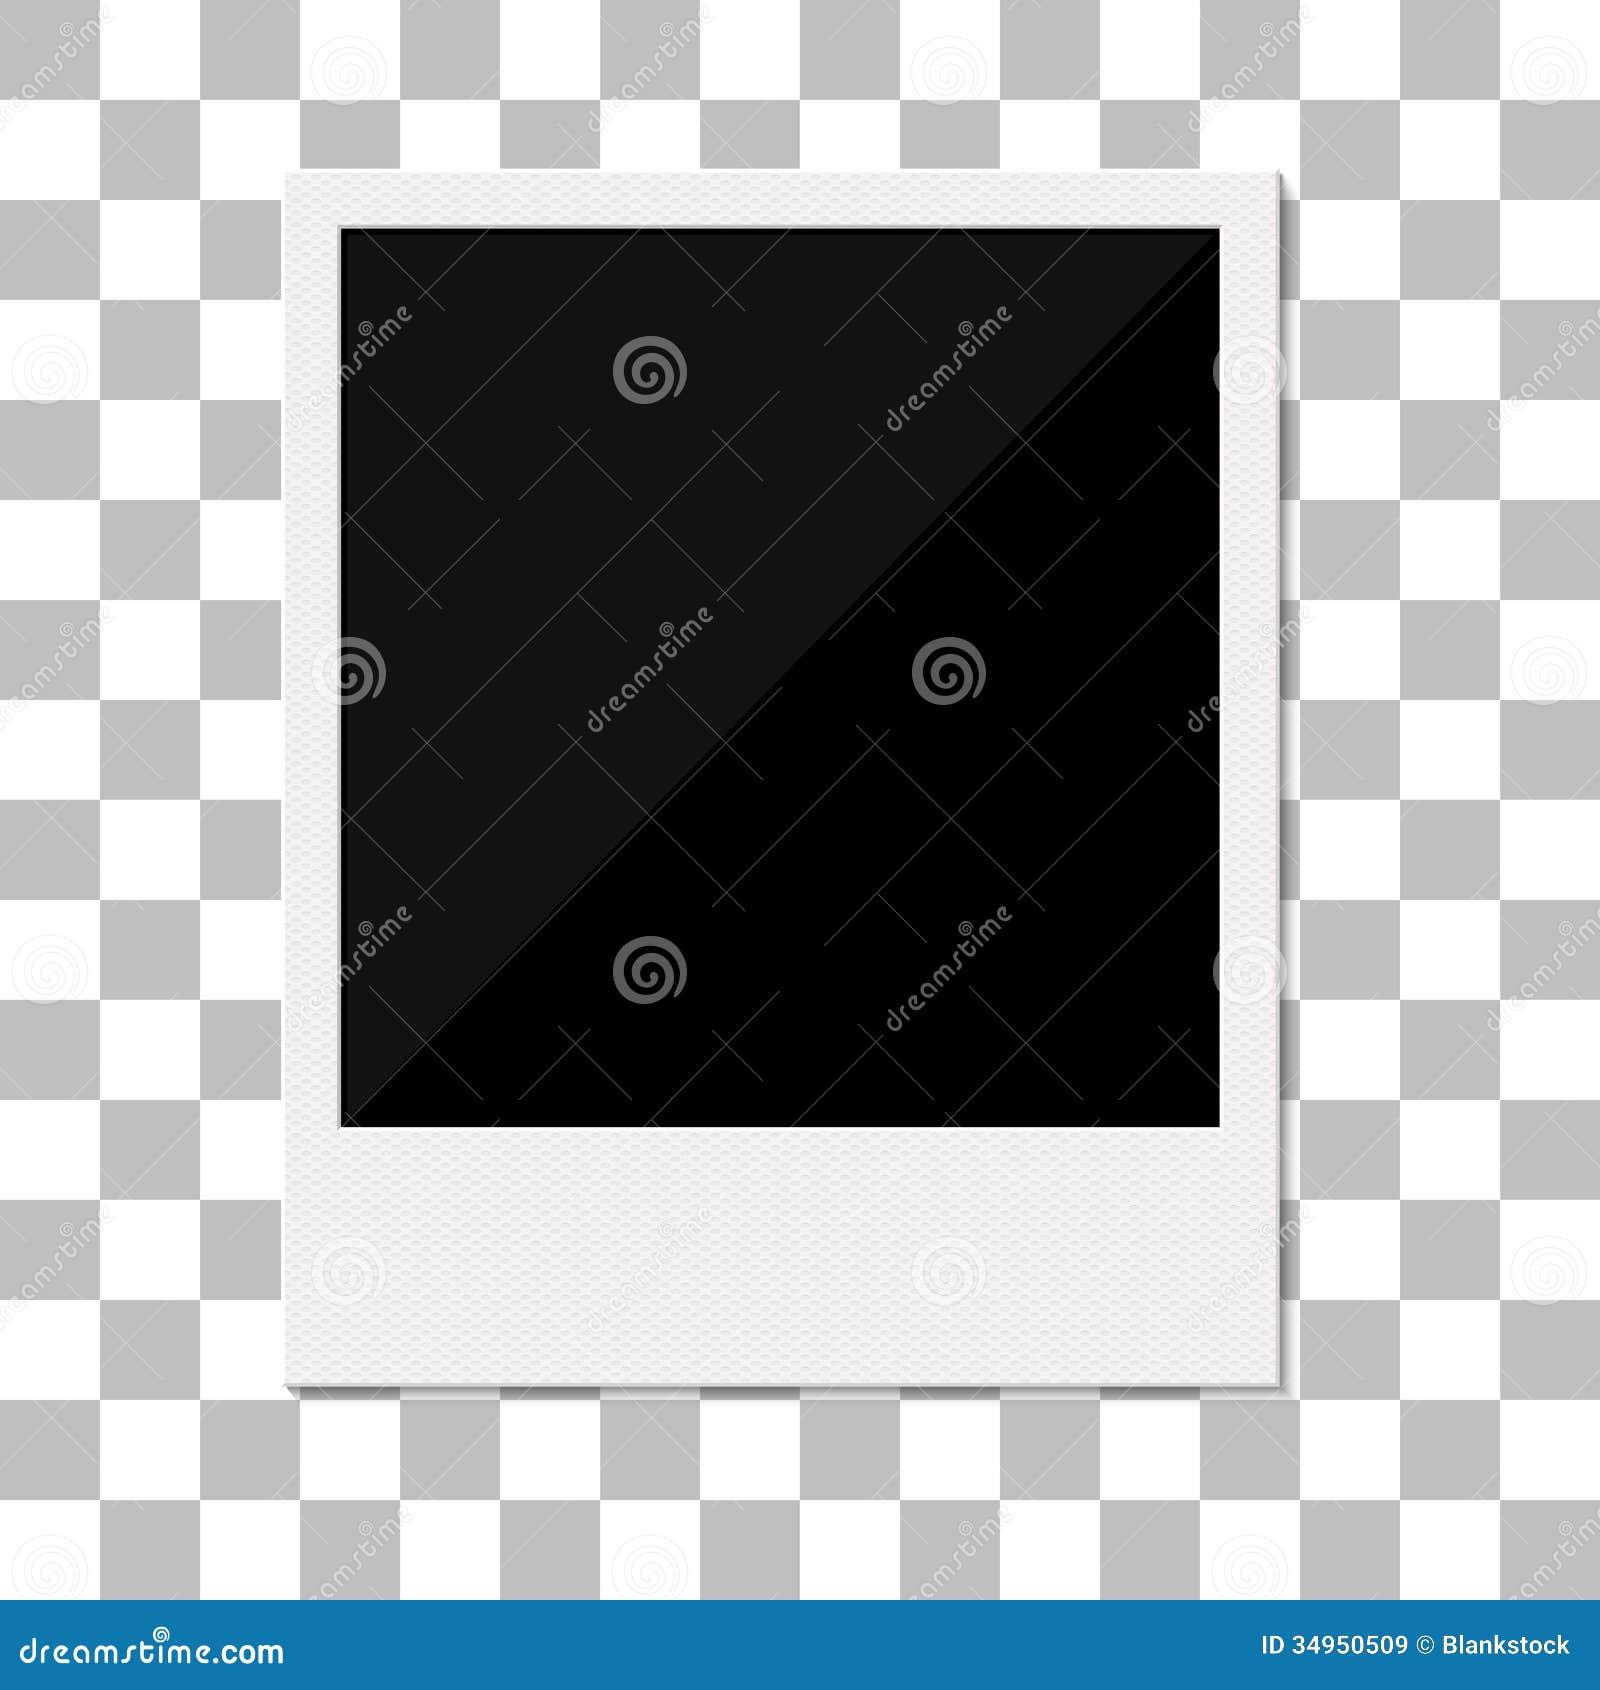 Blank Retro Polaroid Photo Frame. Stock Vector - Illustration of ...